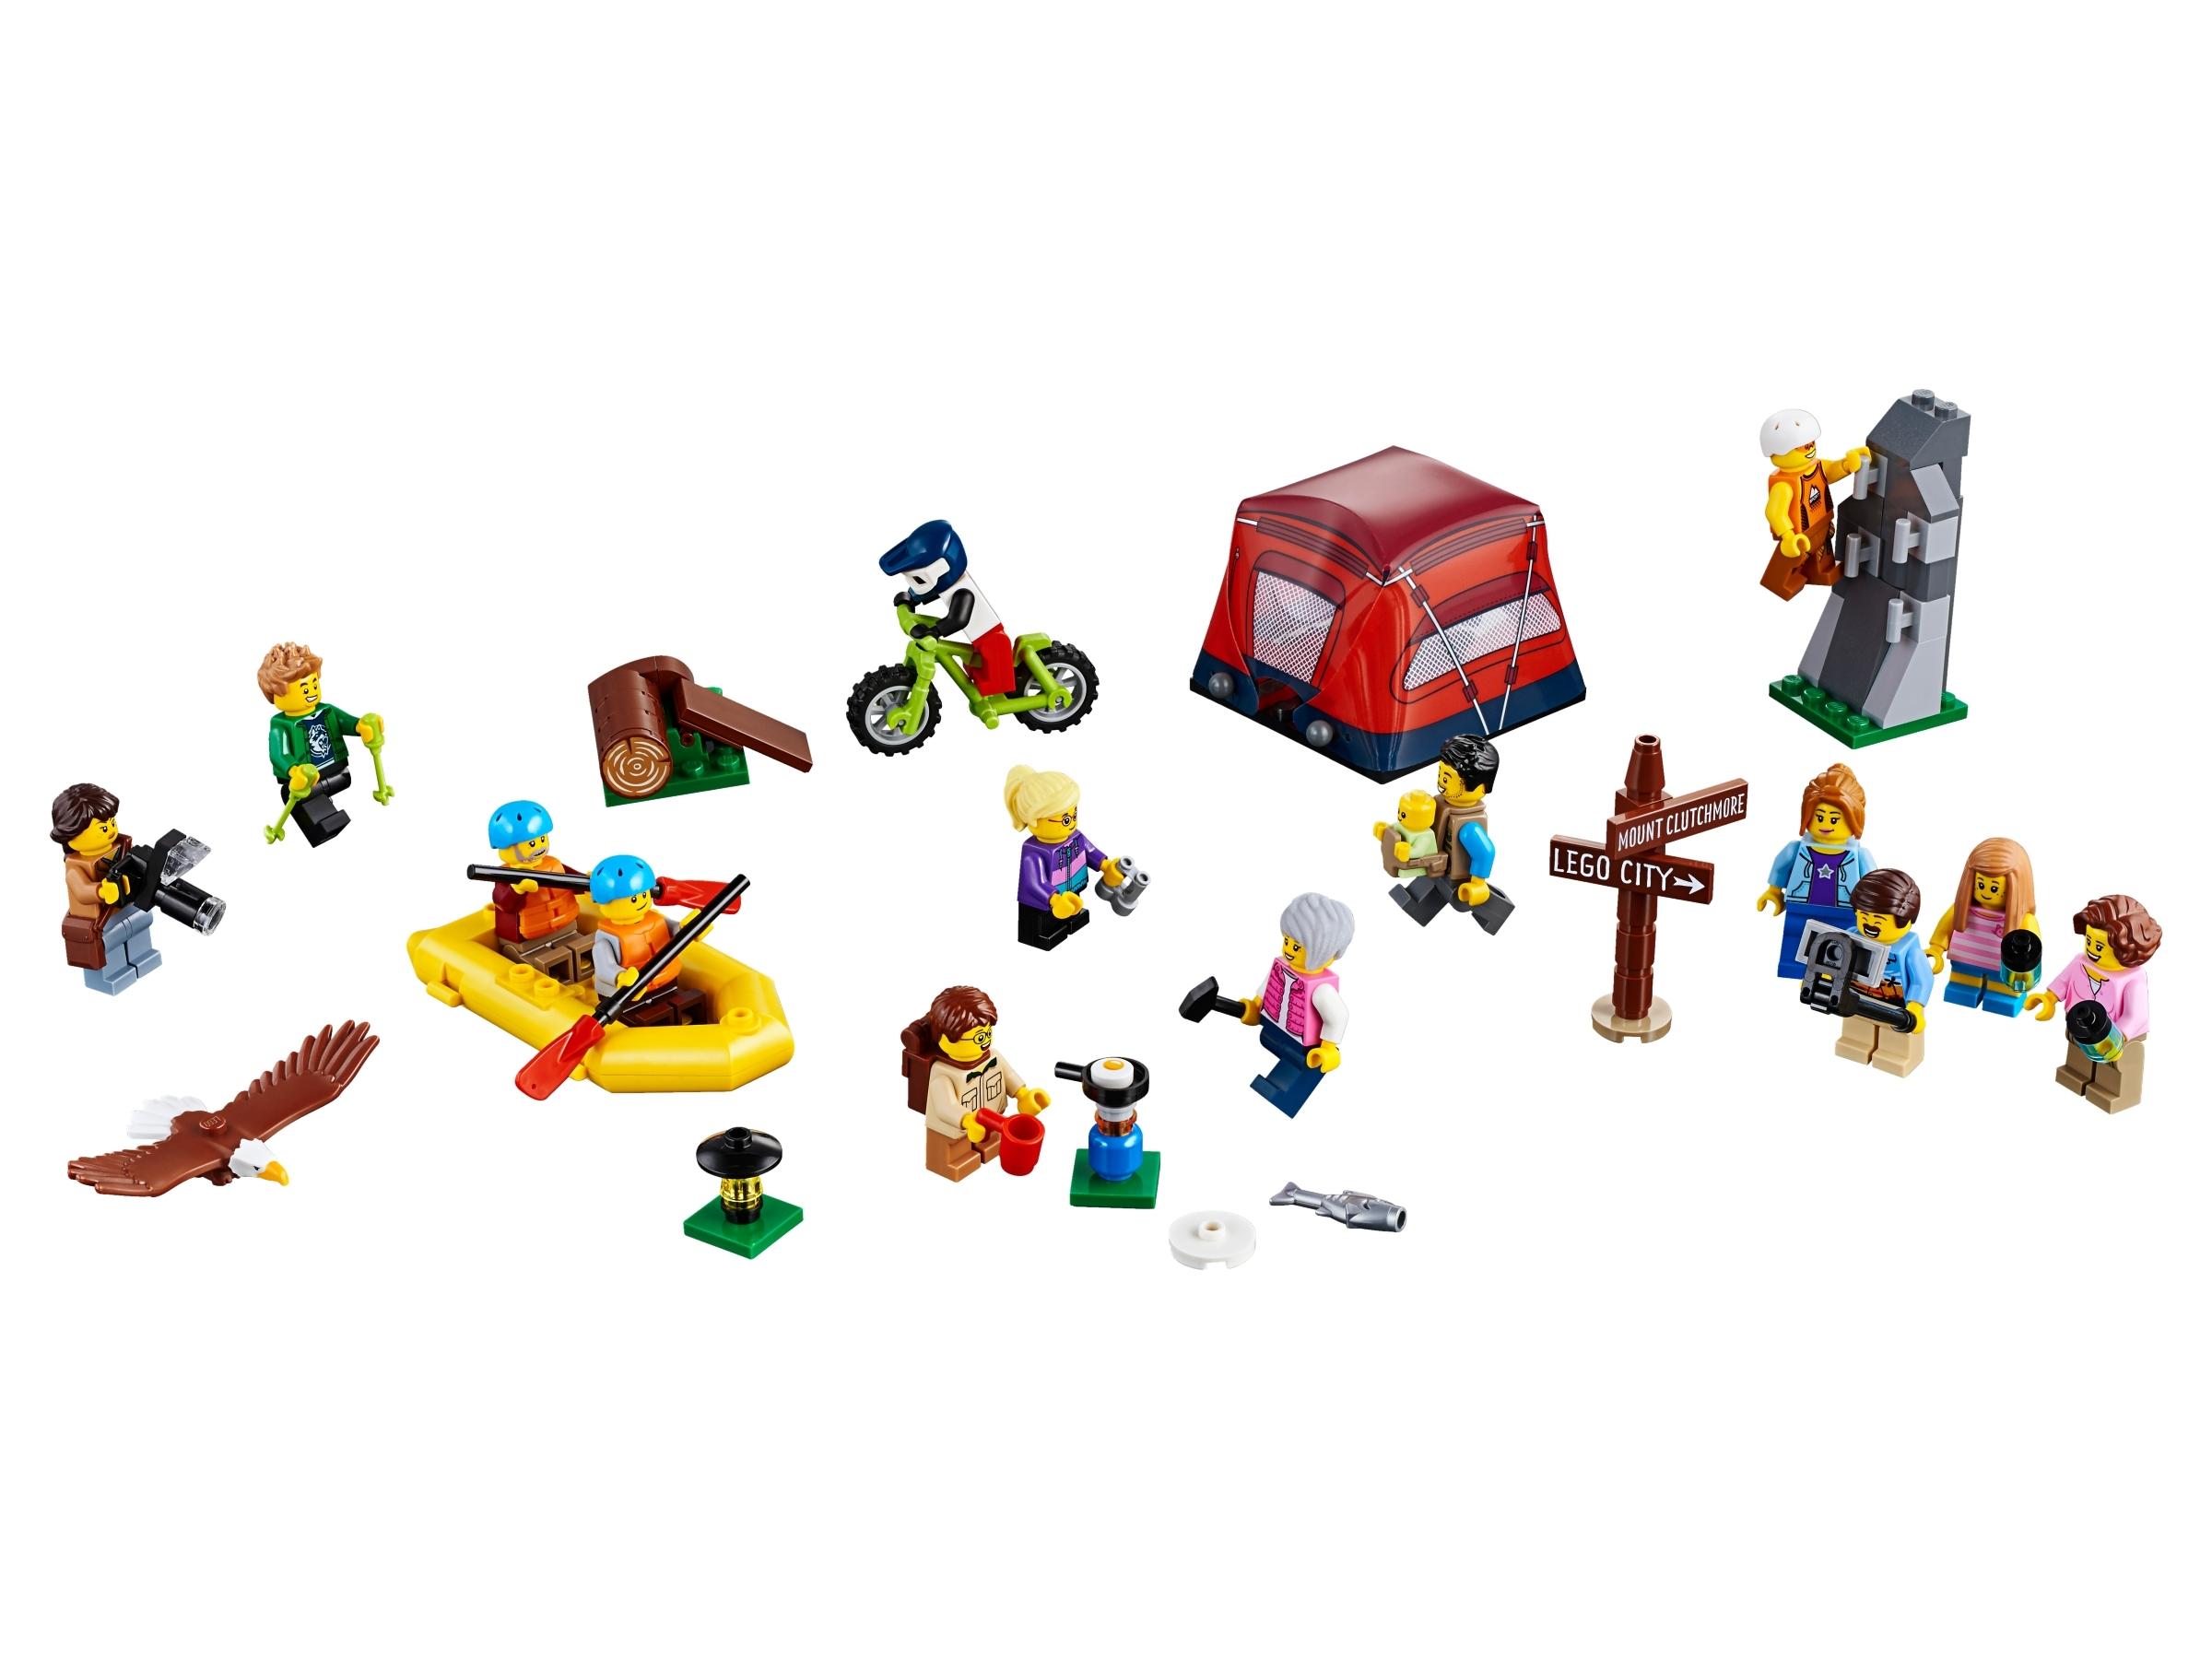 LEGO New Lime Green City Minifigure Camera Accessory Piece